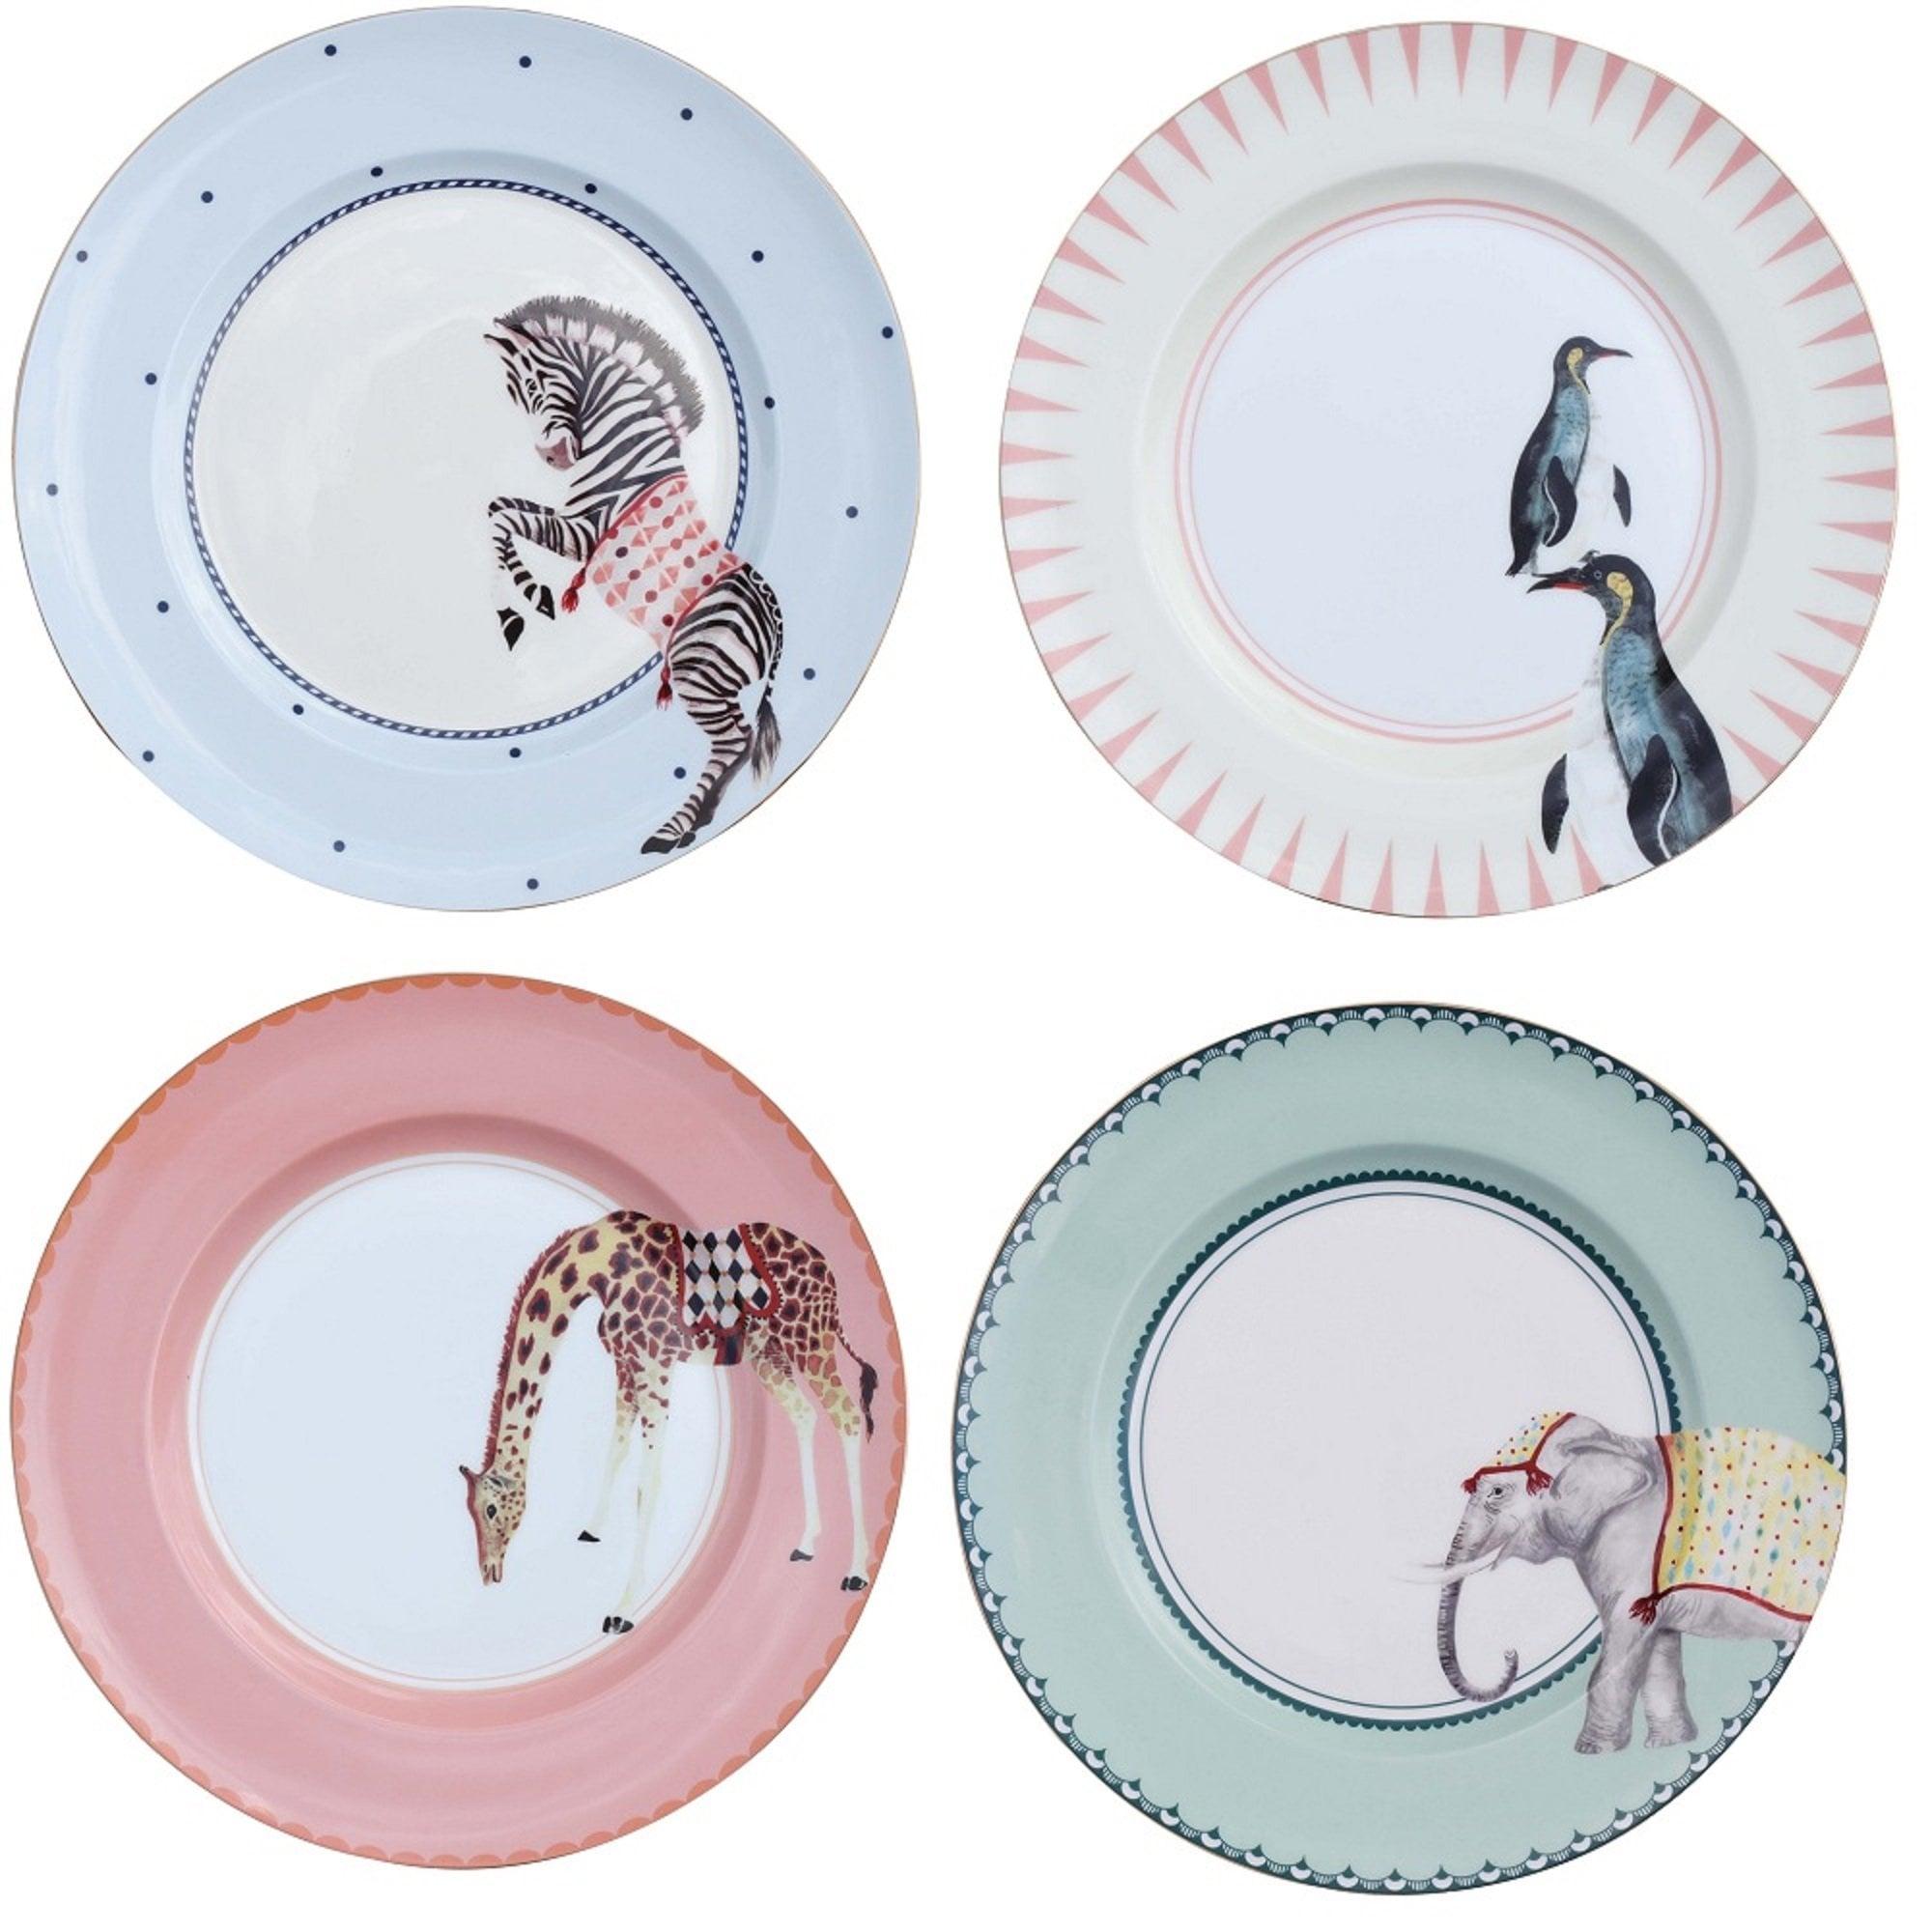 Yvonne Ellen Carnival Animal Dinner Plates Set Of 4 Black By Design